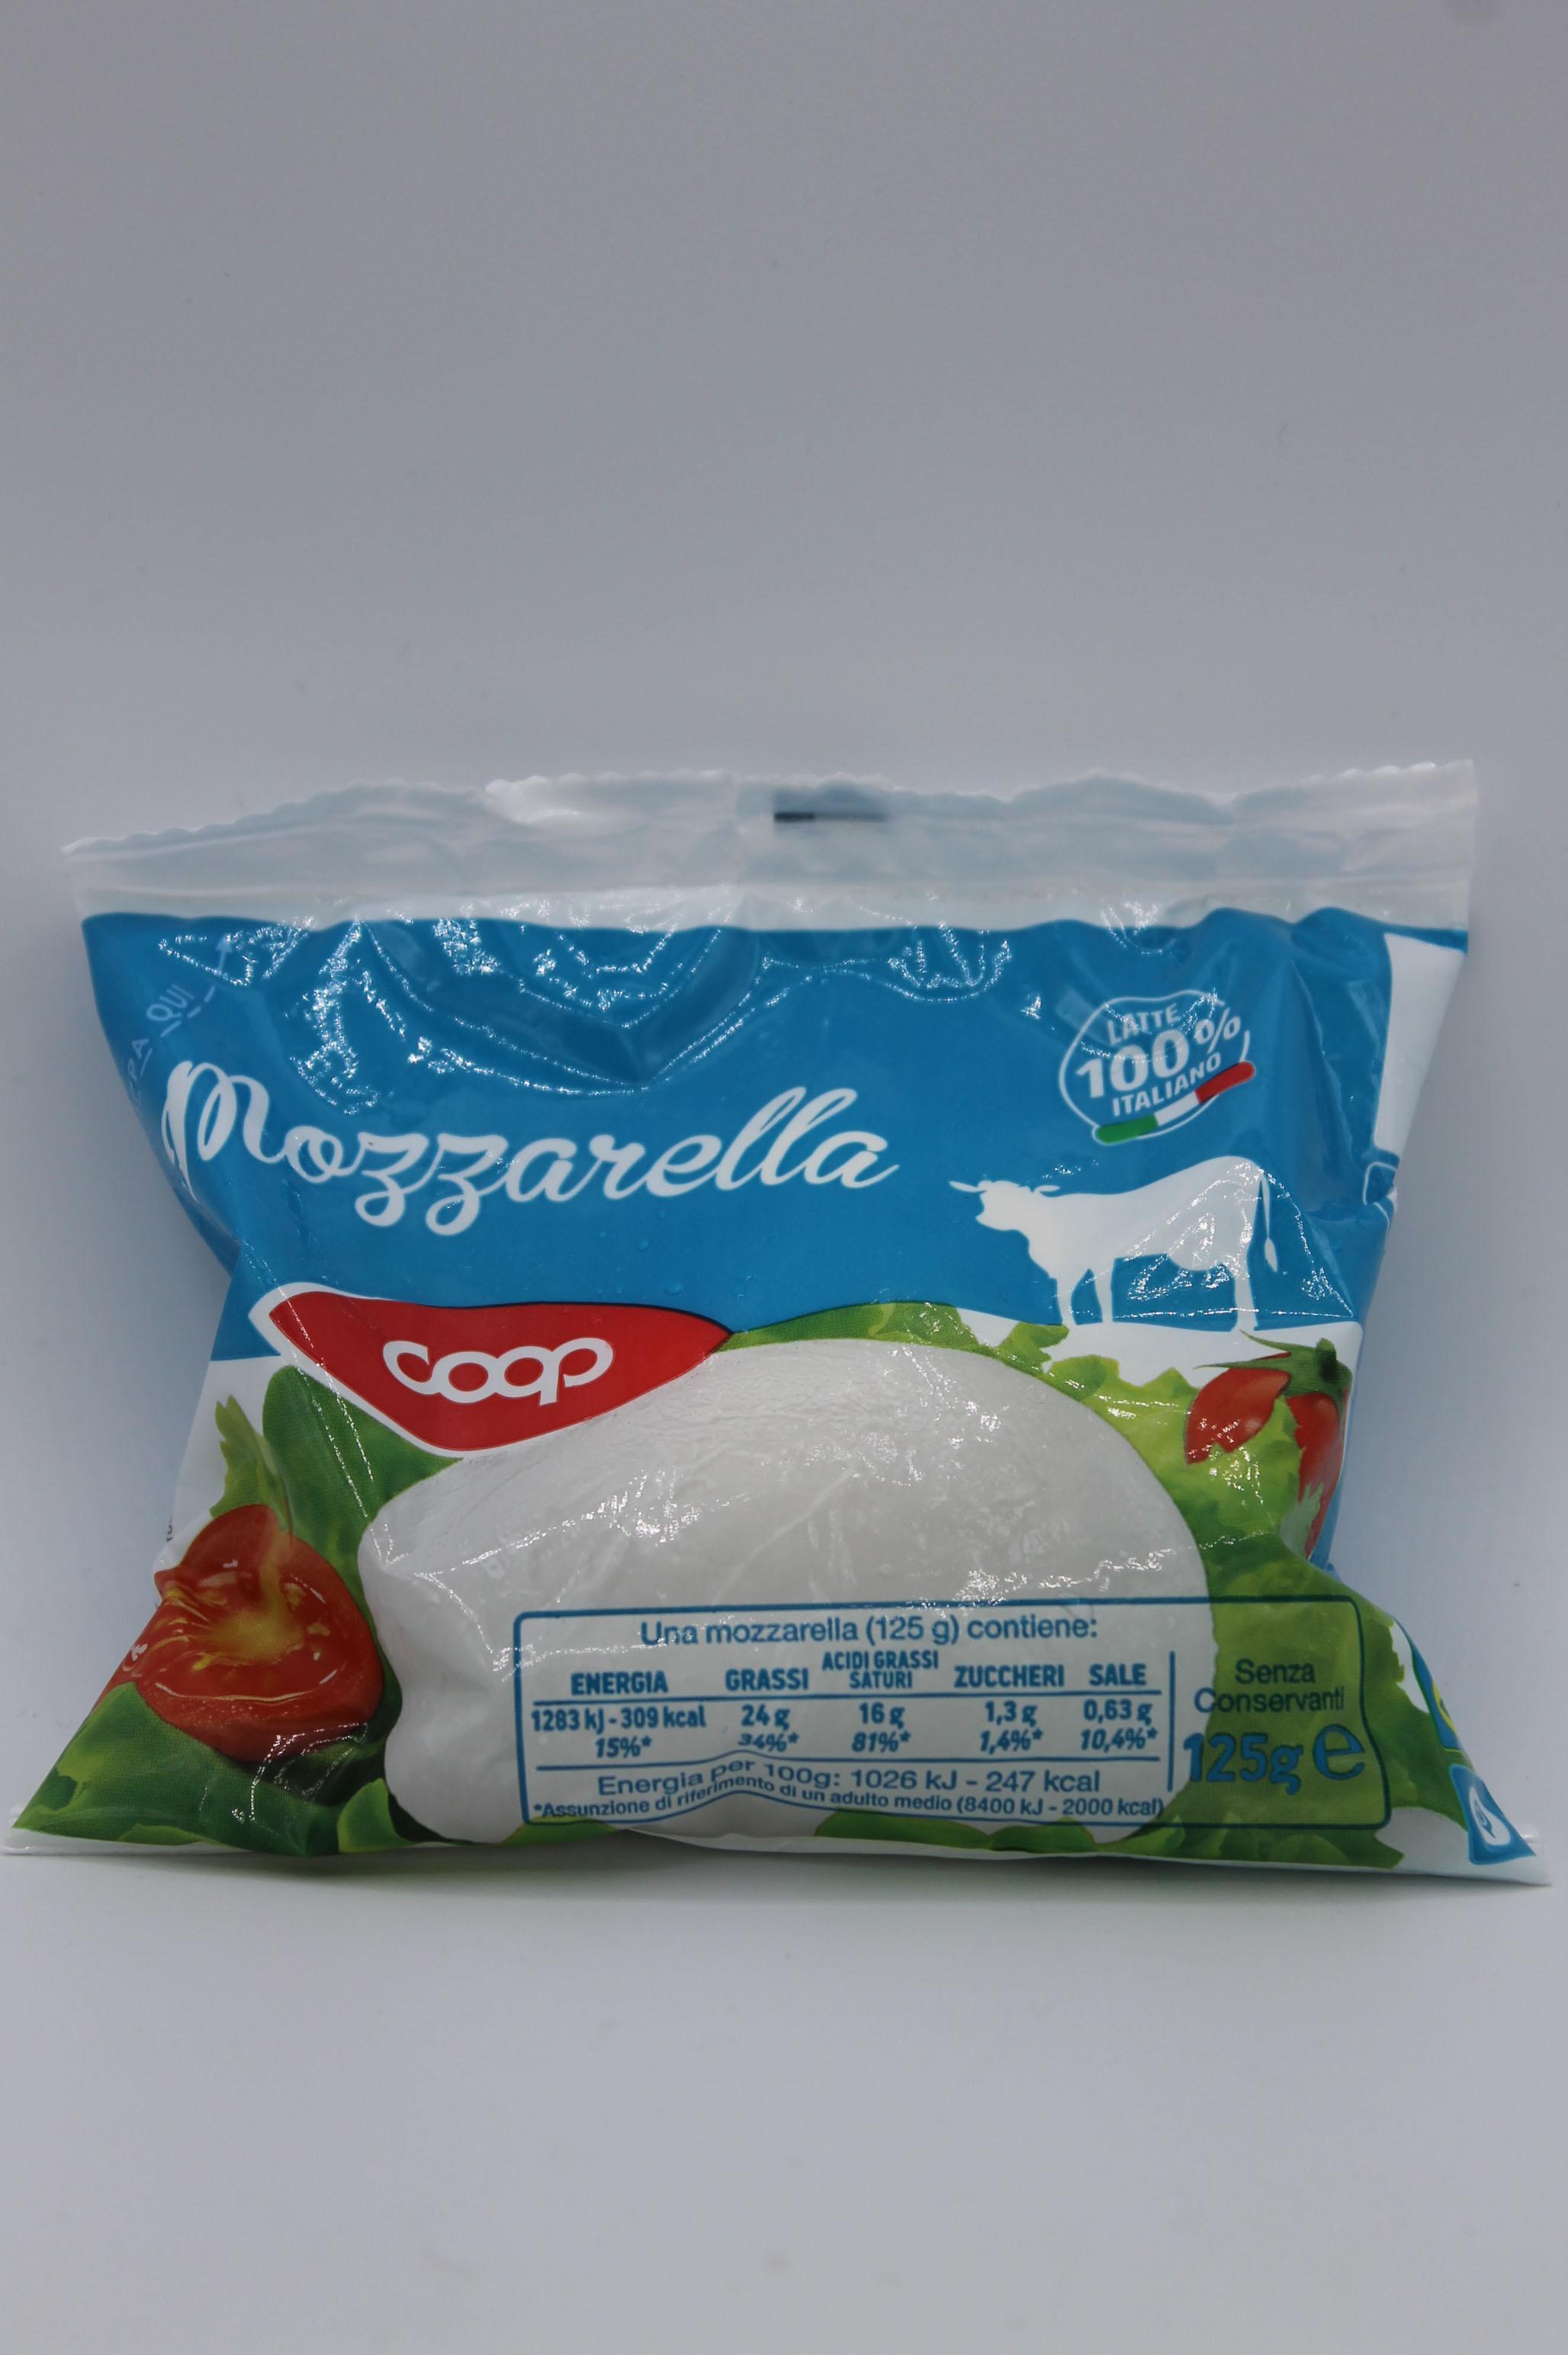 Coop mozzarella busta 125gr.